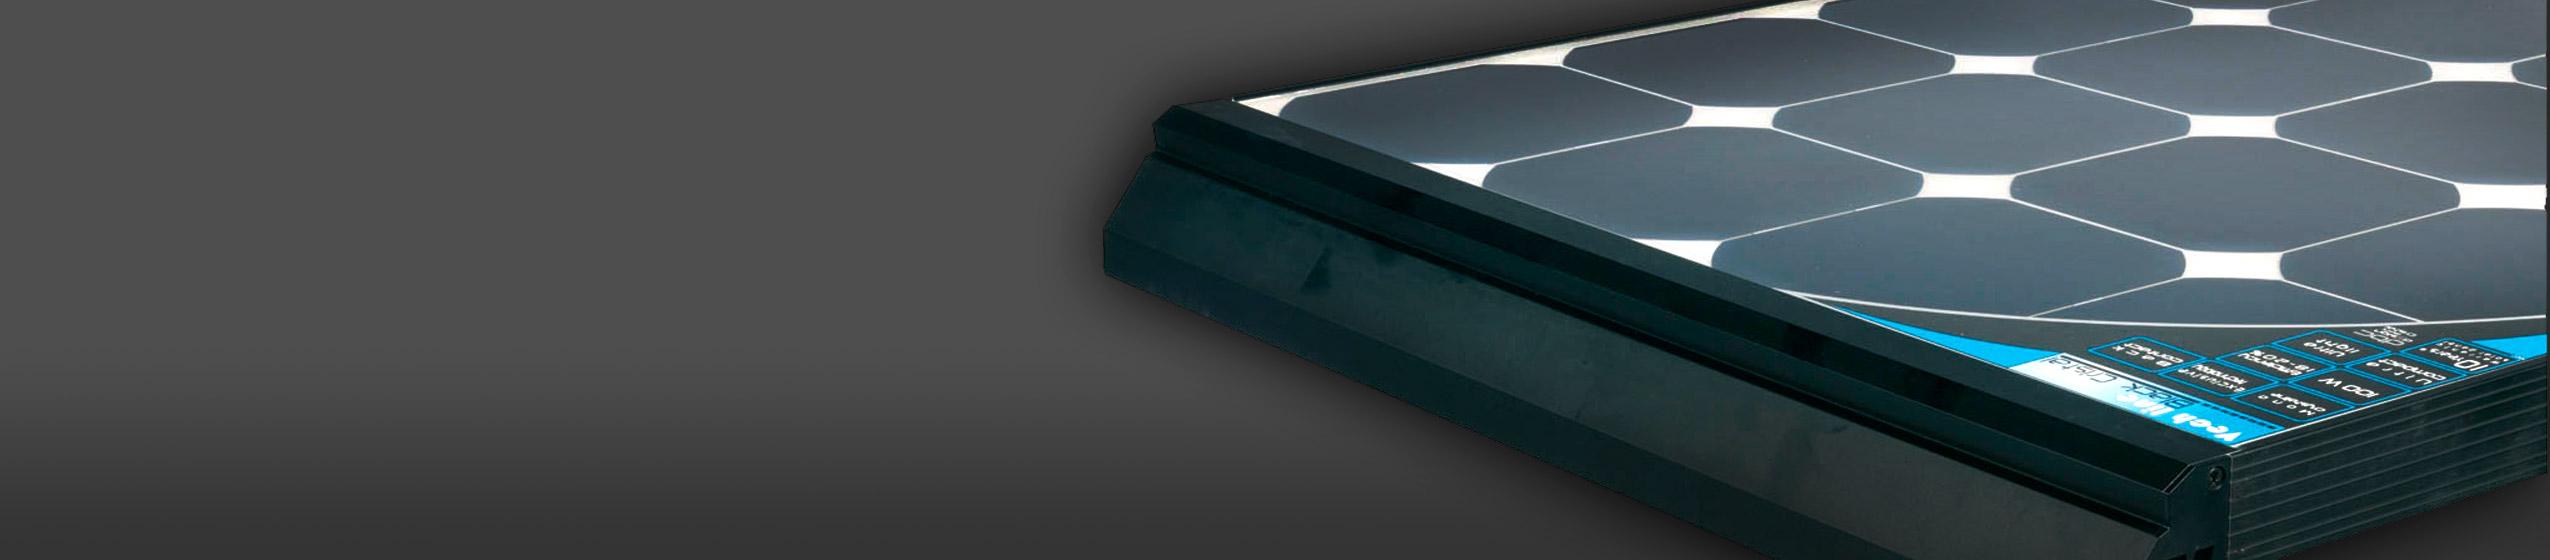 Placa Solar Black Cristal 120Ah - Caravaning Integral